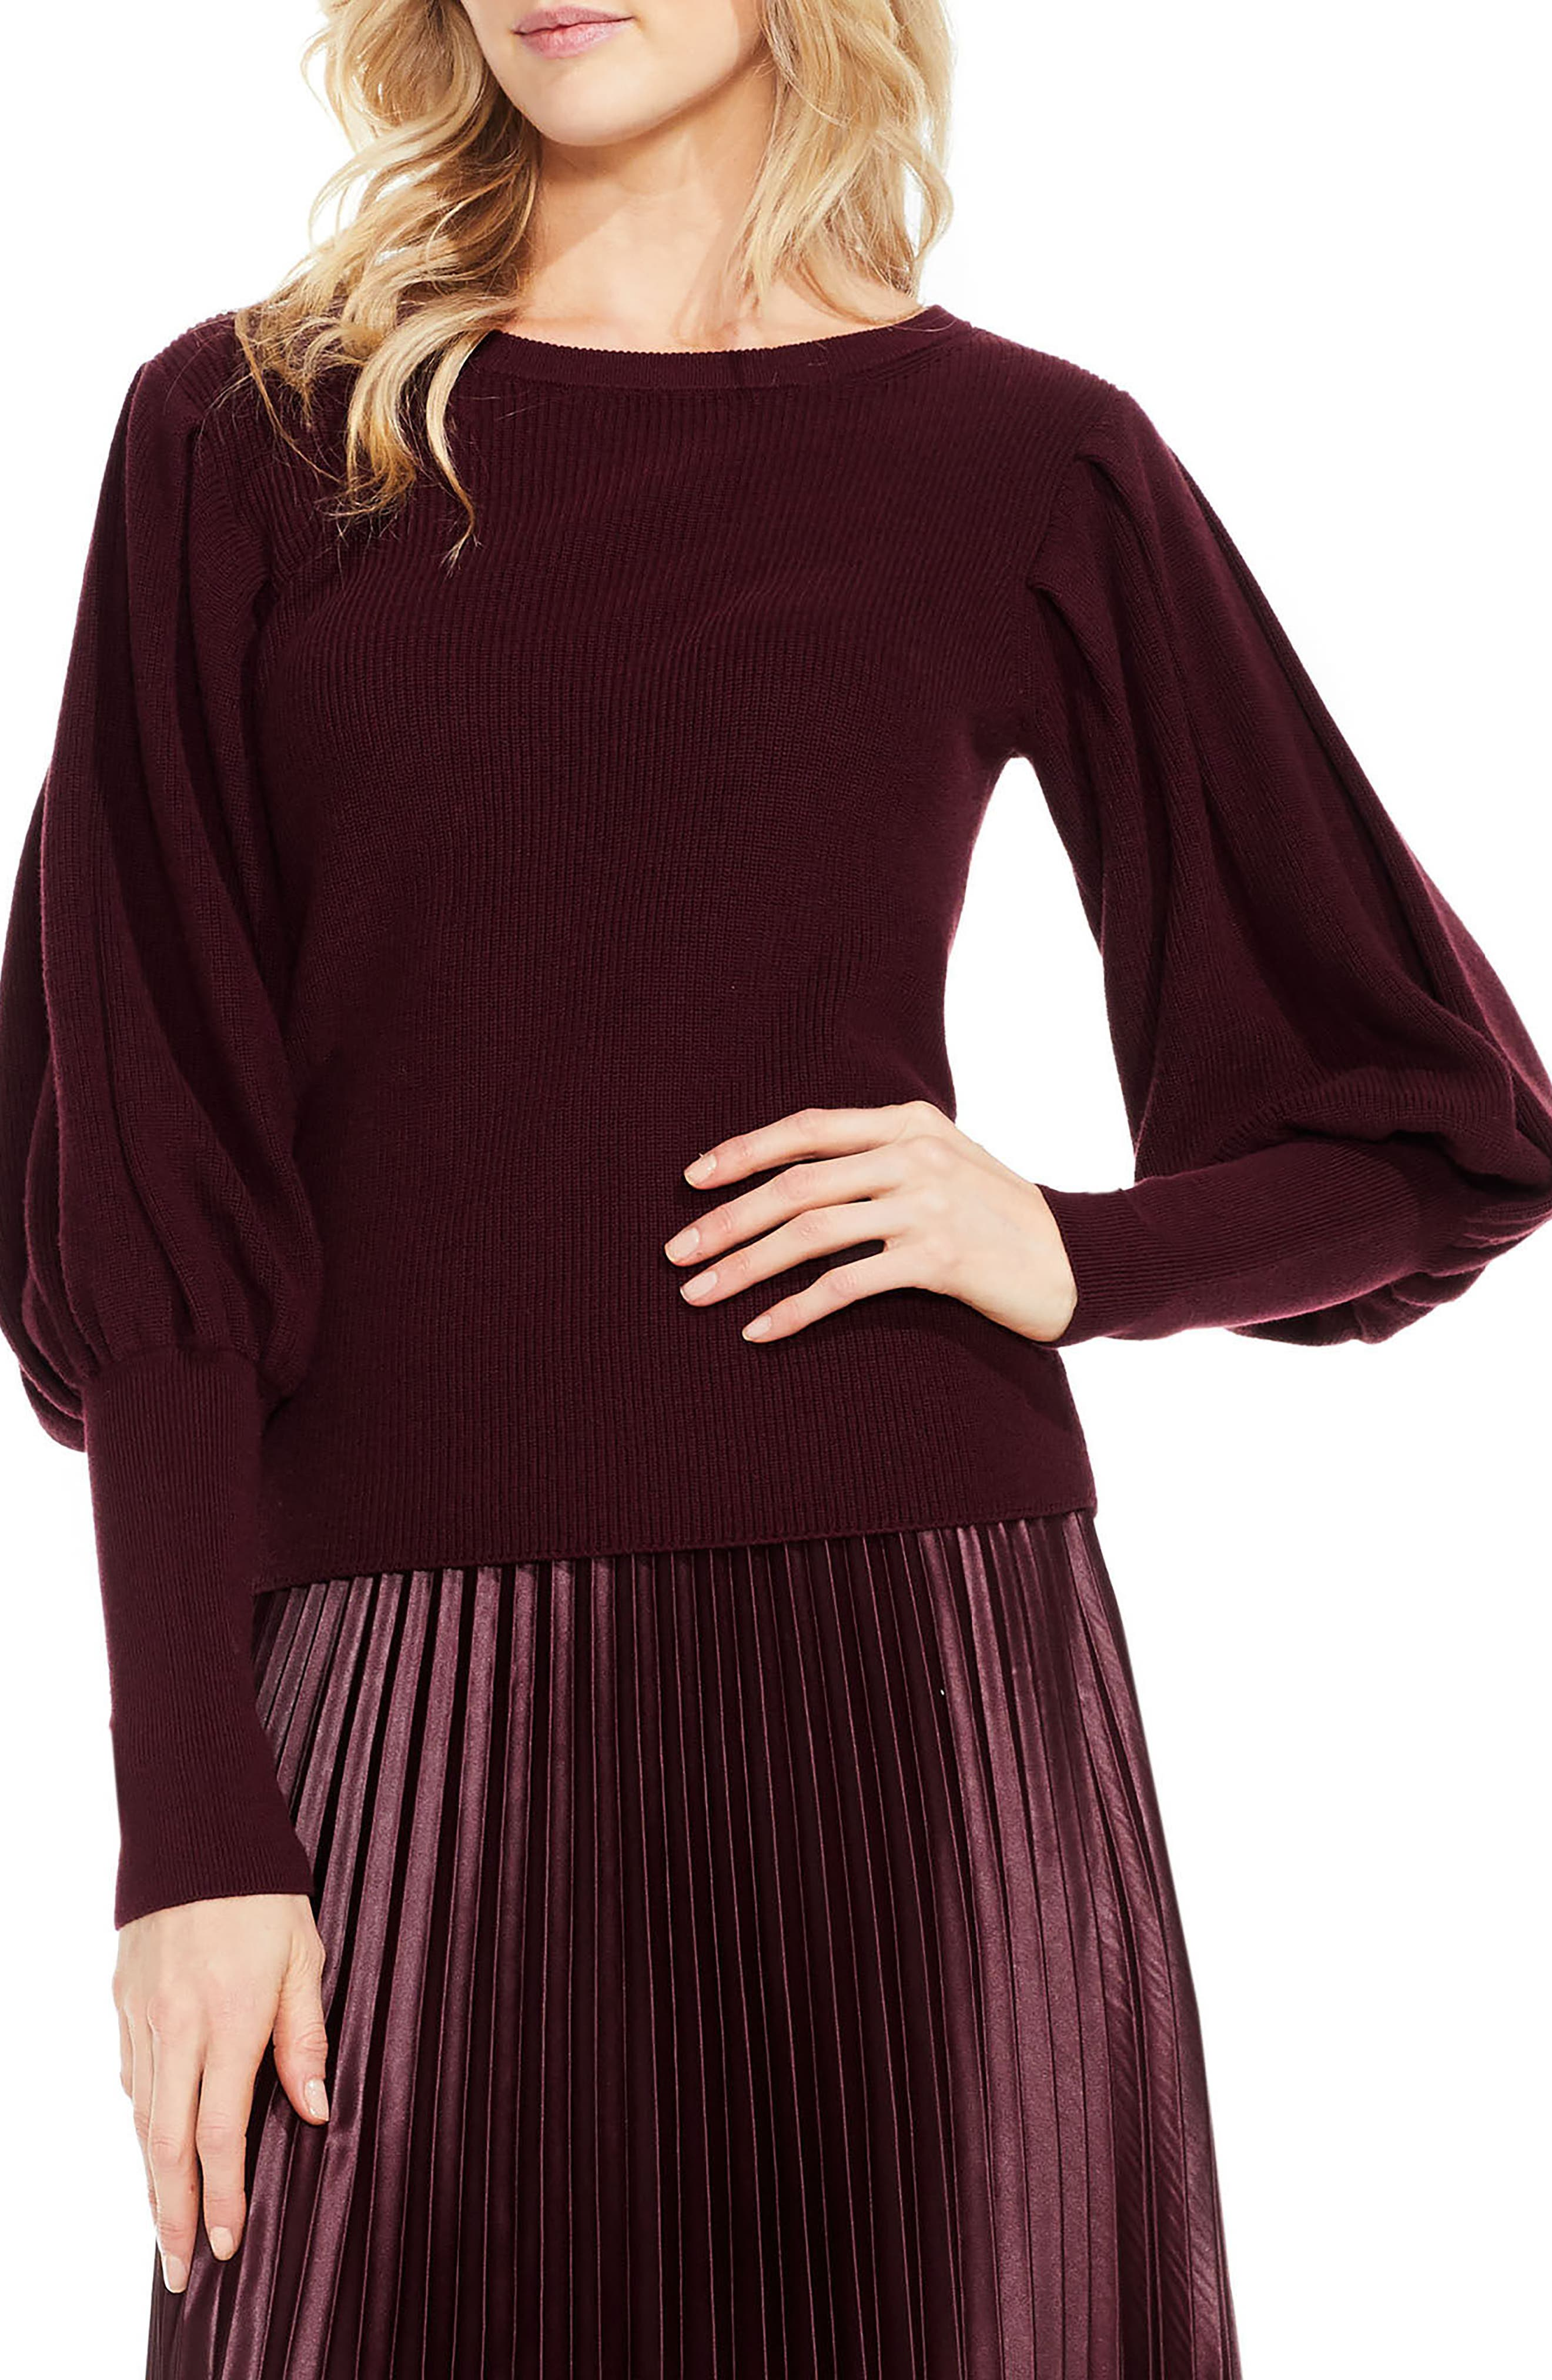 Main Image - Vince Camuto Bubble Sleeve Sweater (Regular & Petite)